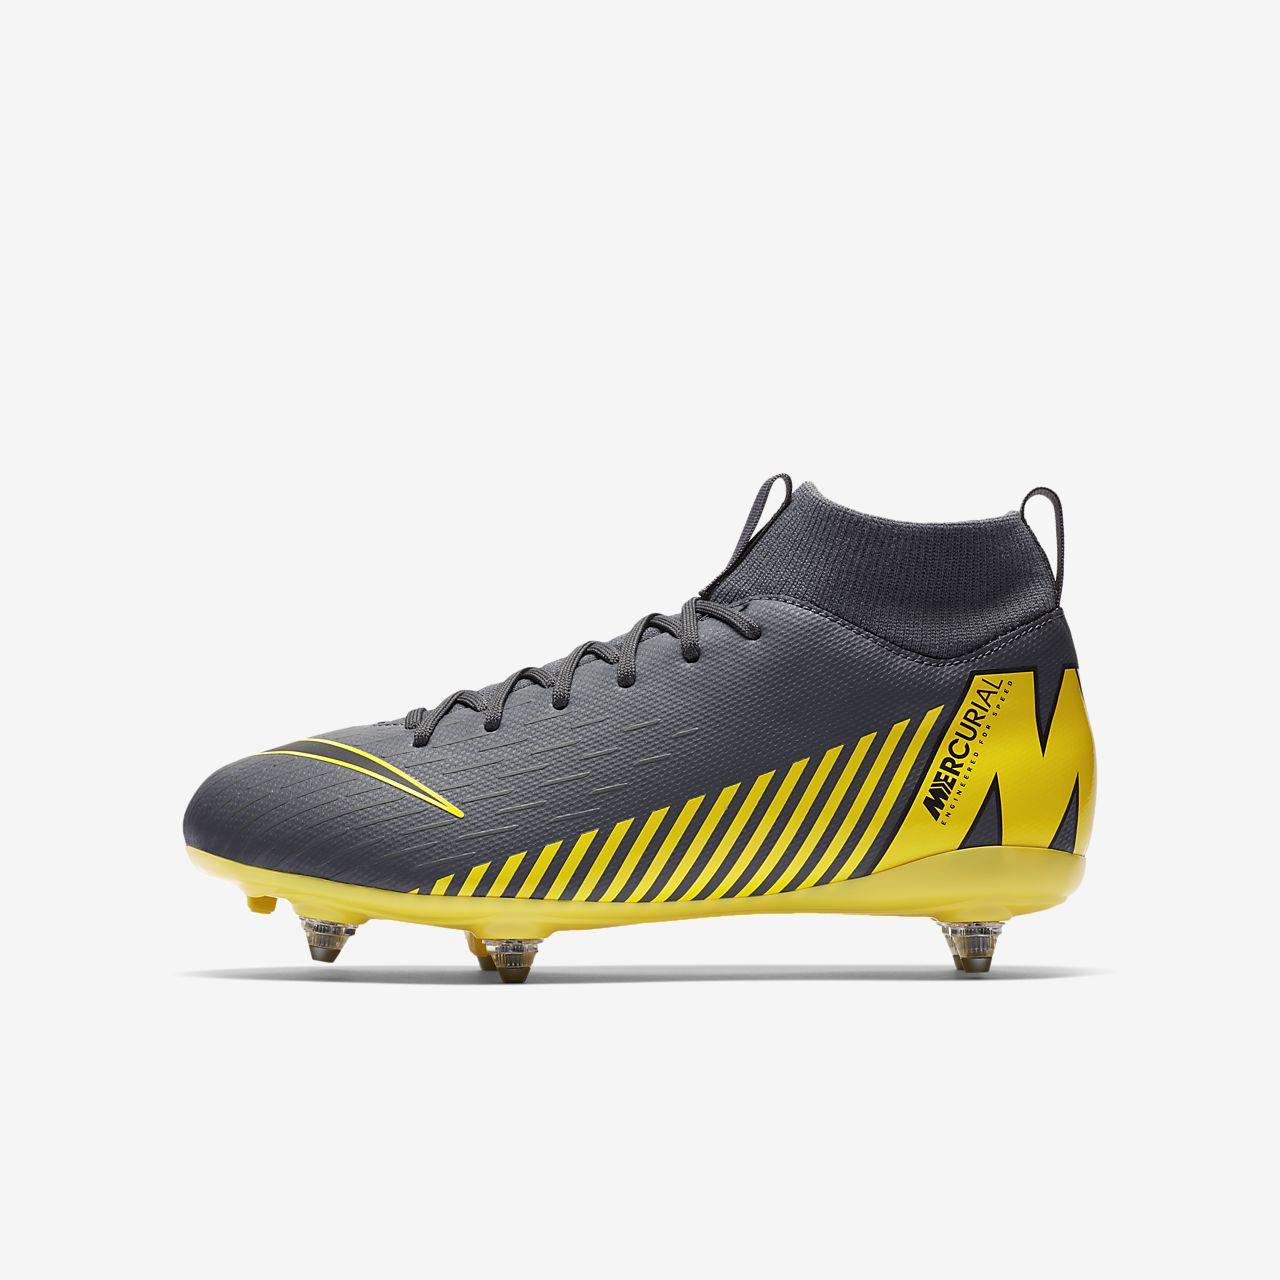 buy popular 66672 29c96 ... Nike Jr. Mercurial Superfly VI Academy SG-PRO Voetbalschoen voor  kleuters/kids (